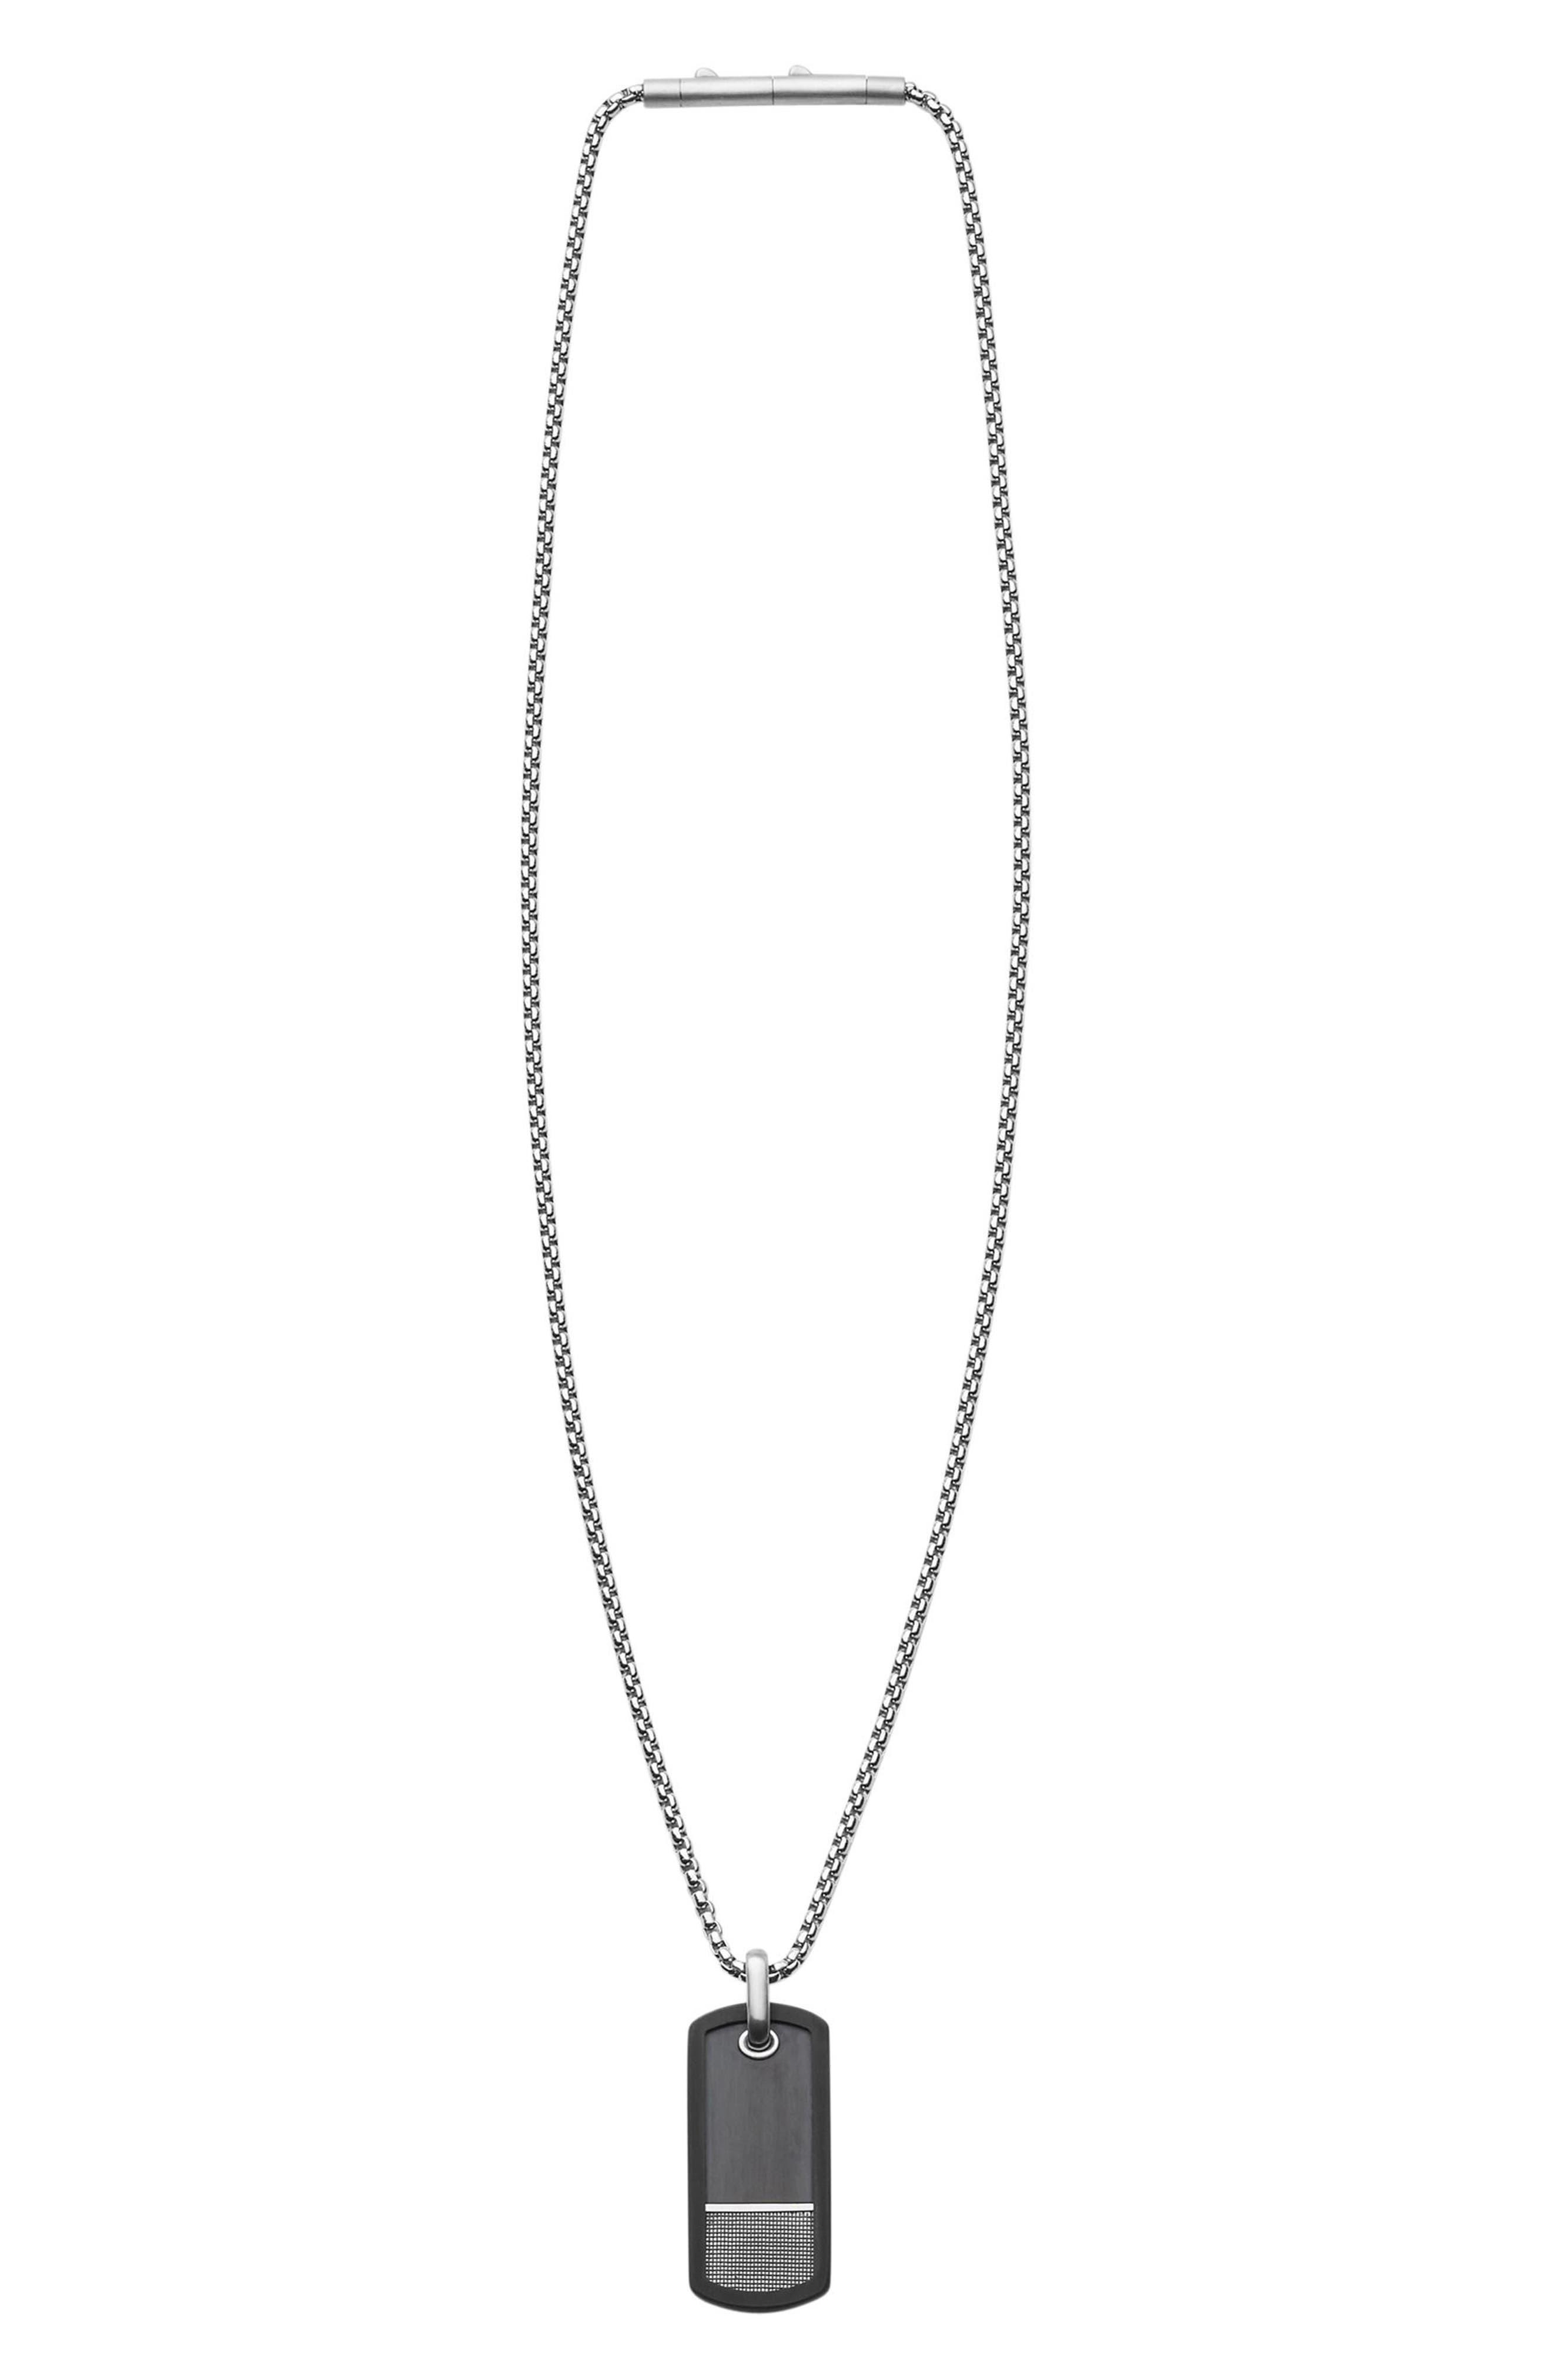 Kring Necklace,                             Alternate thumbnail 3, color,                             048